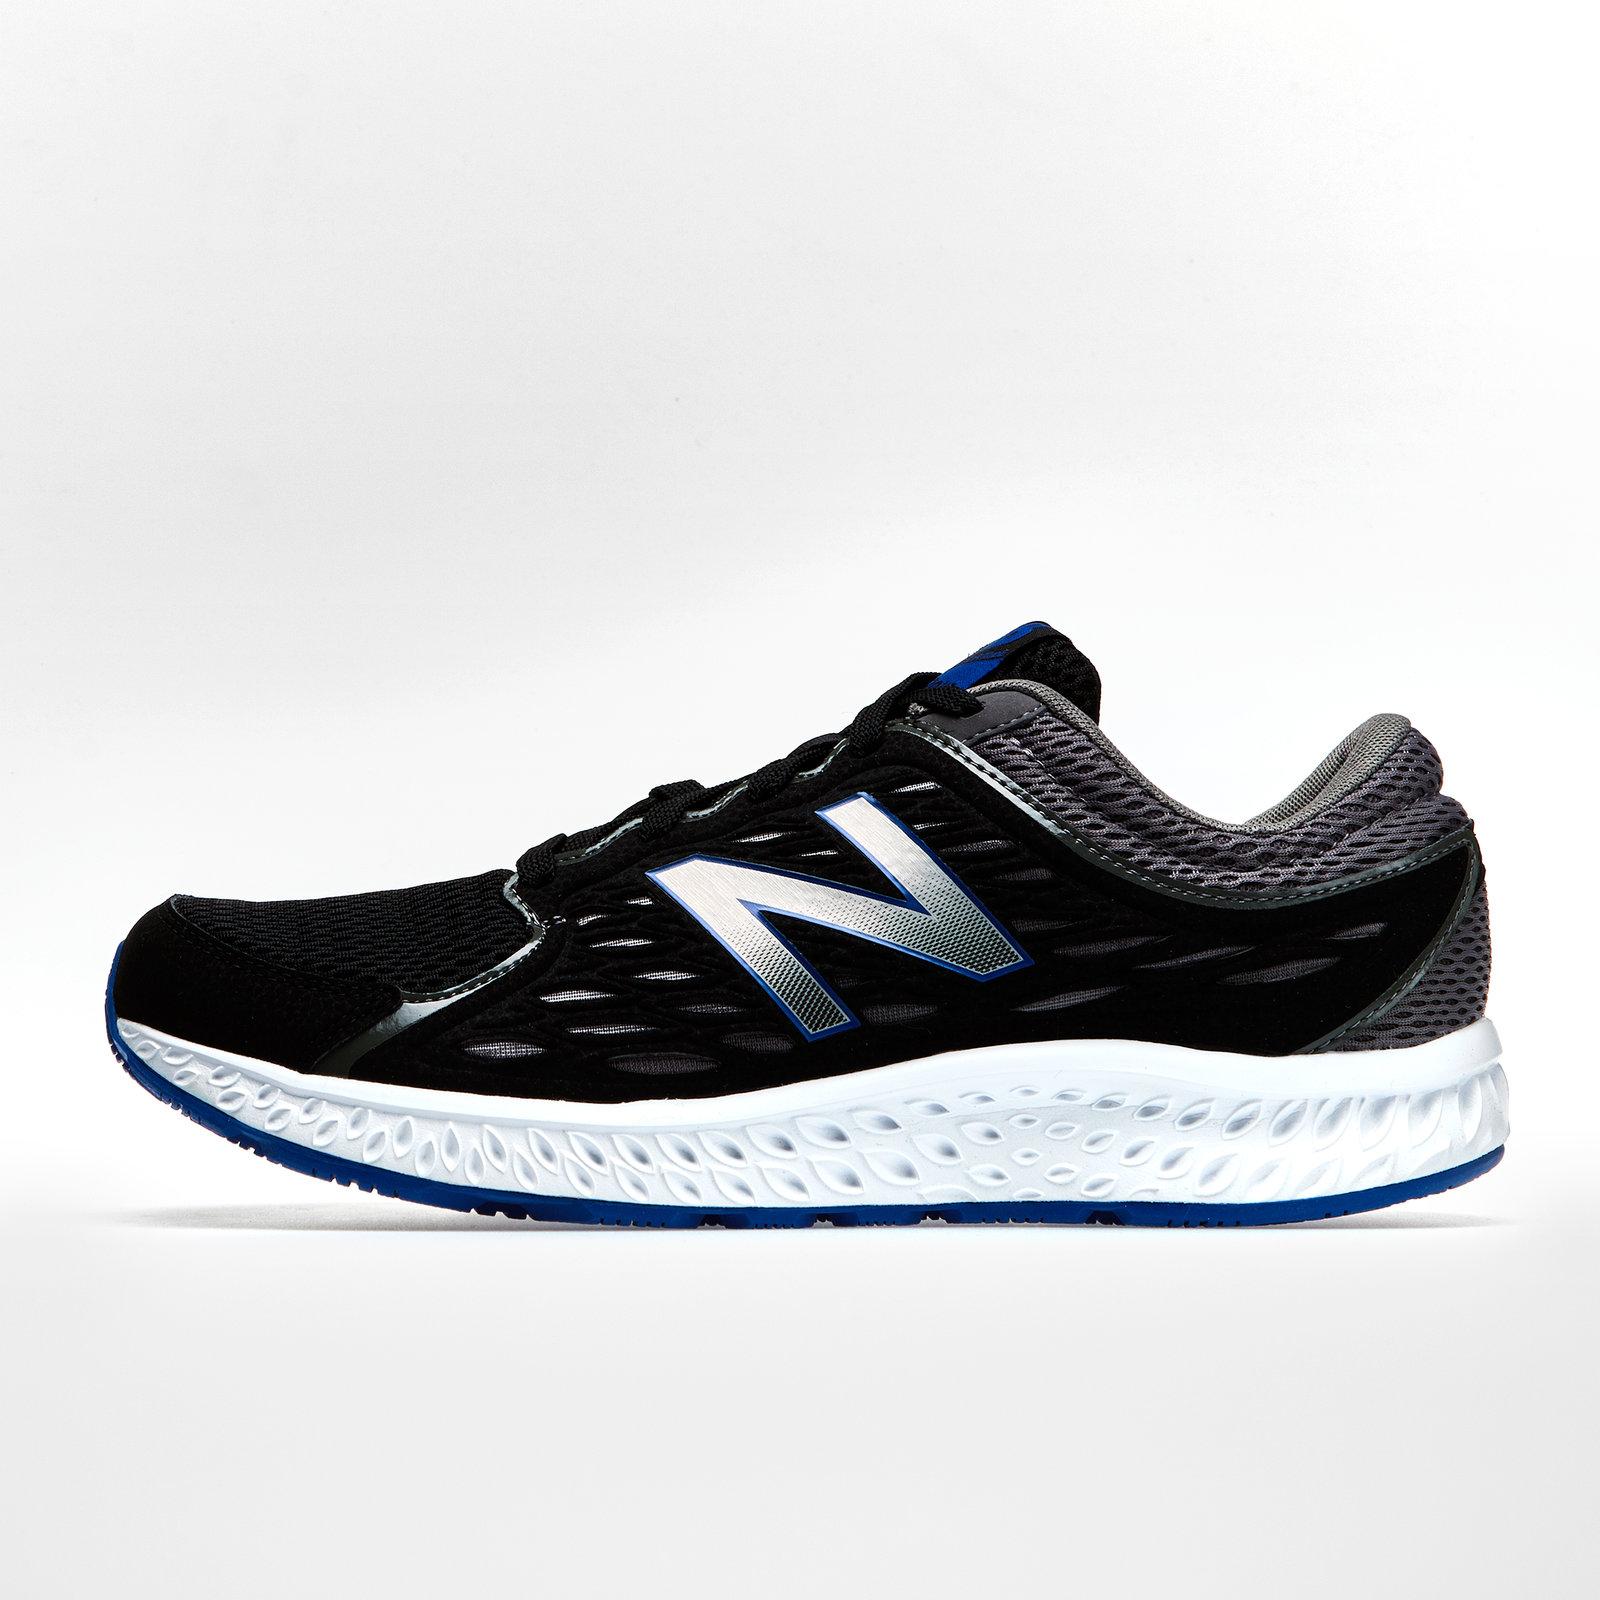 Image of 420 V3 Mens Running Shoes